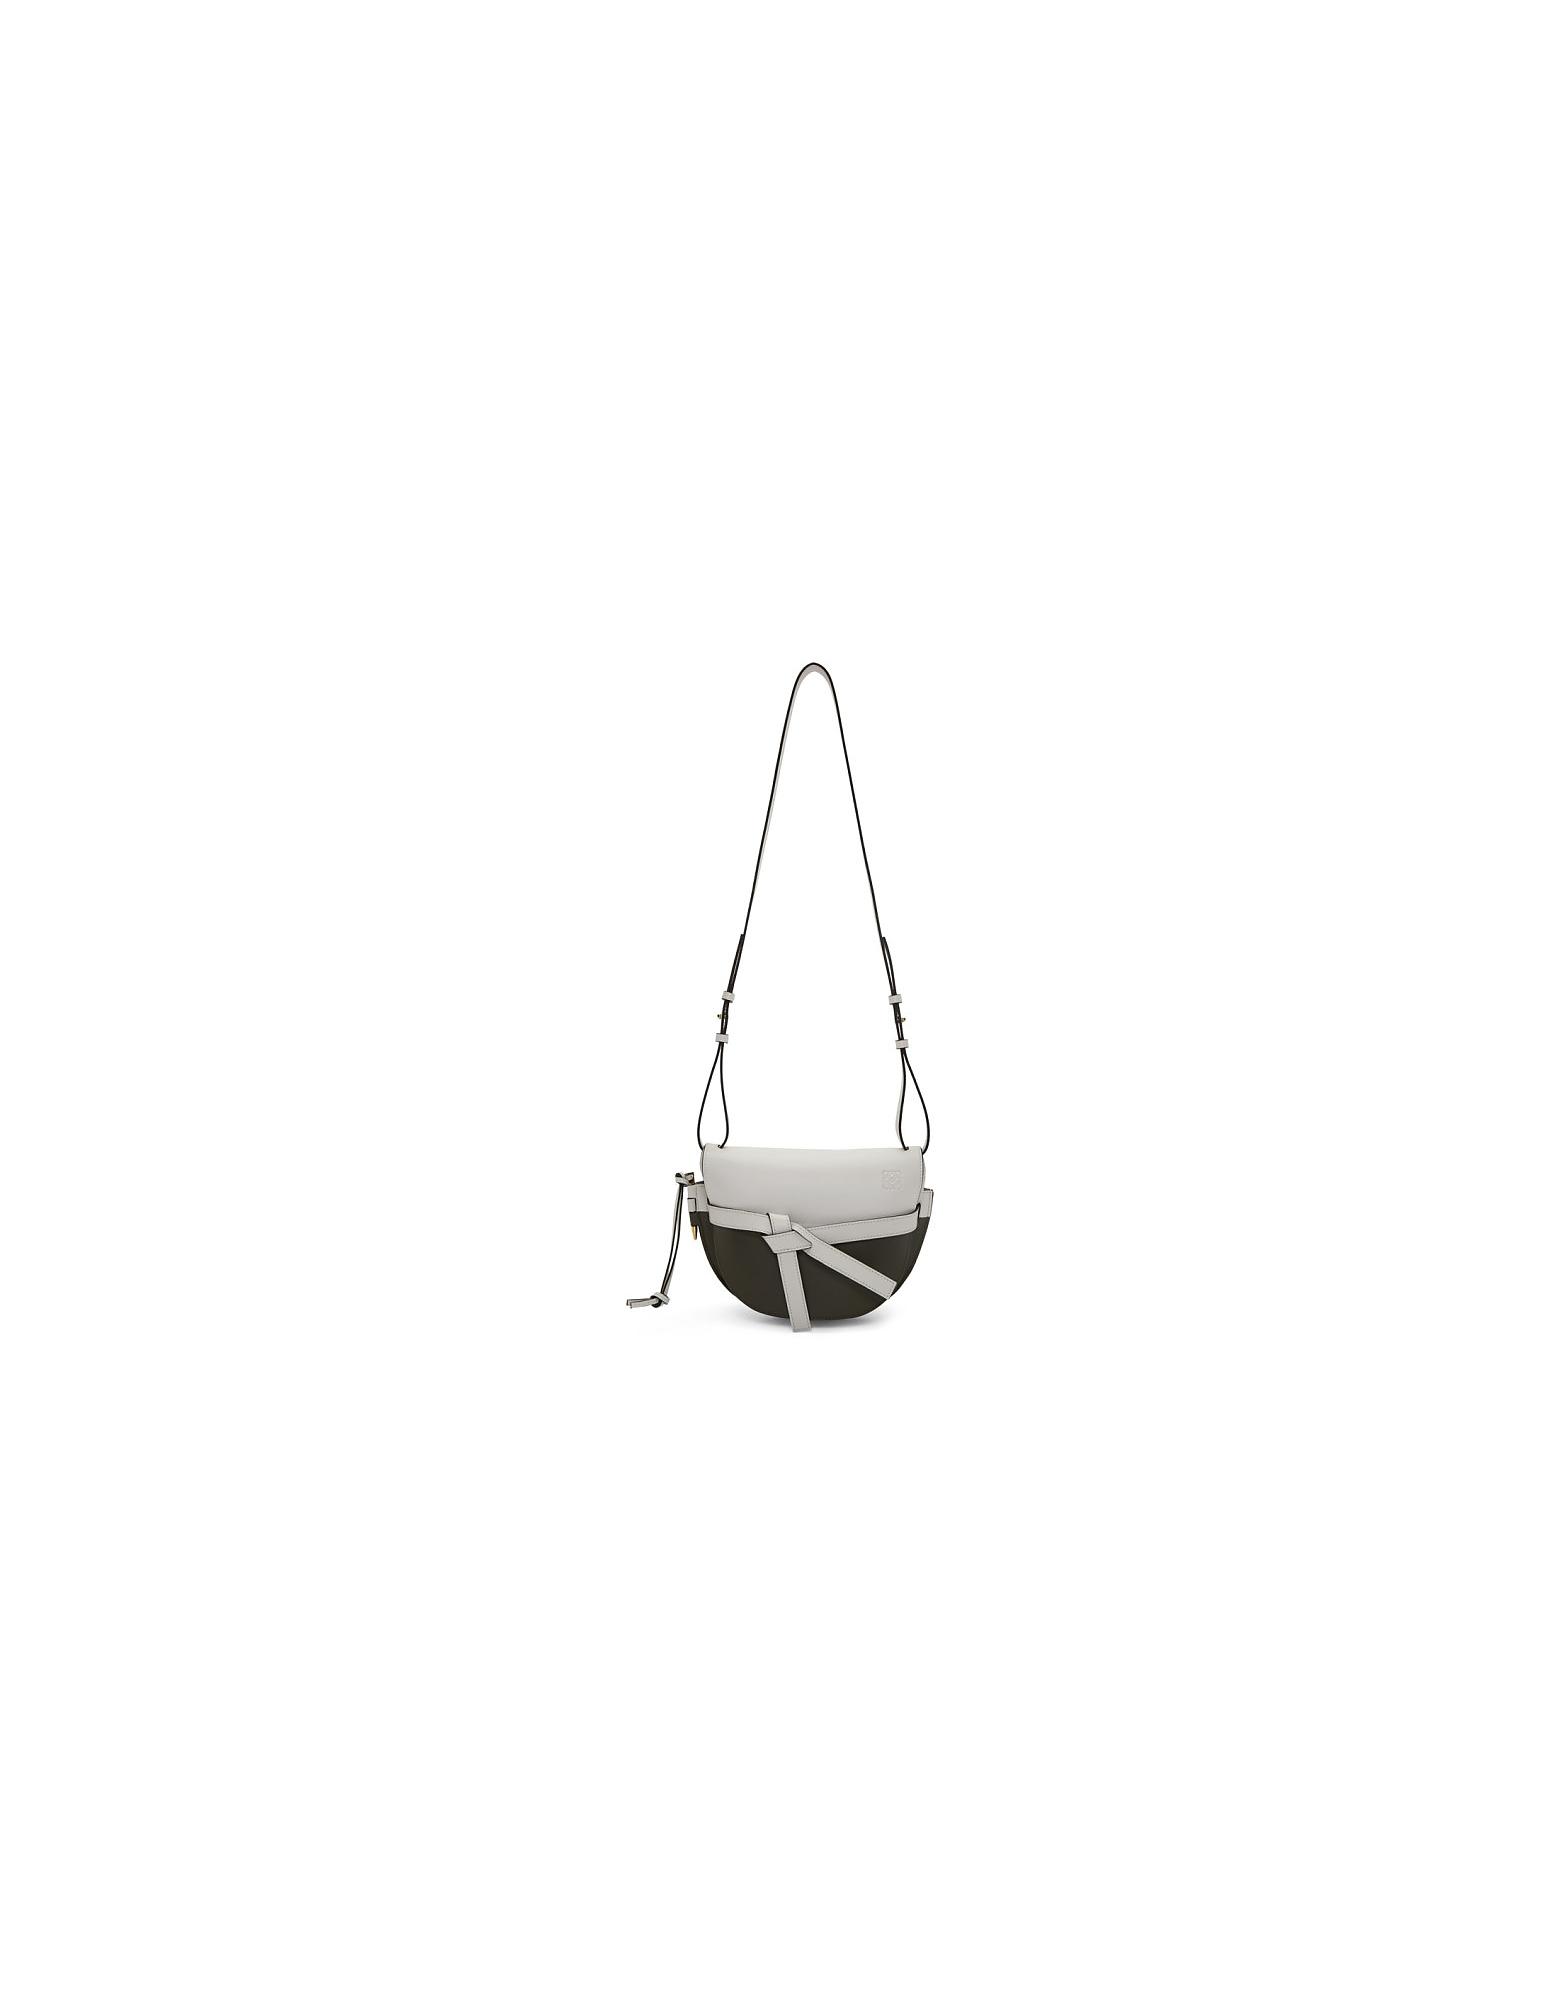 Loewe Designer Handbags, Green and White Small Gate Bag